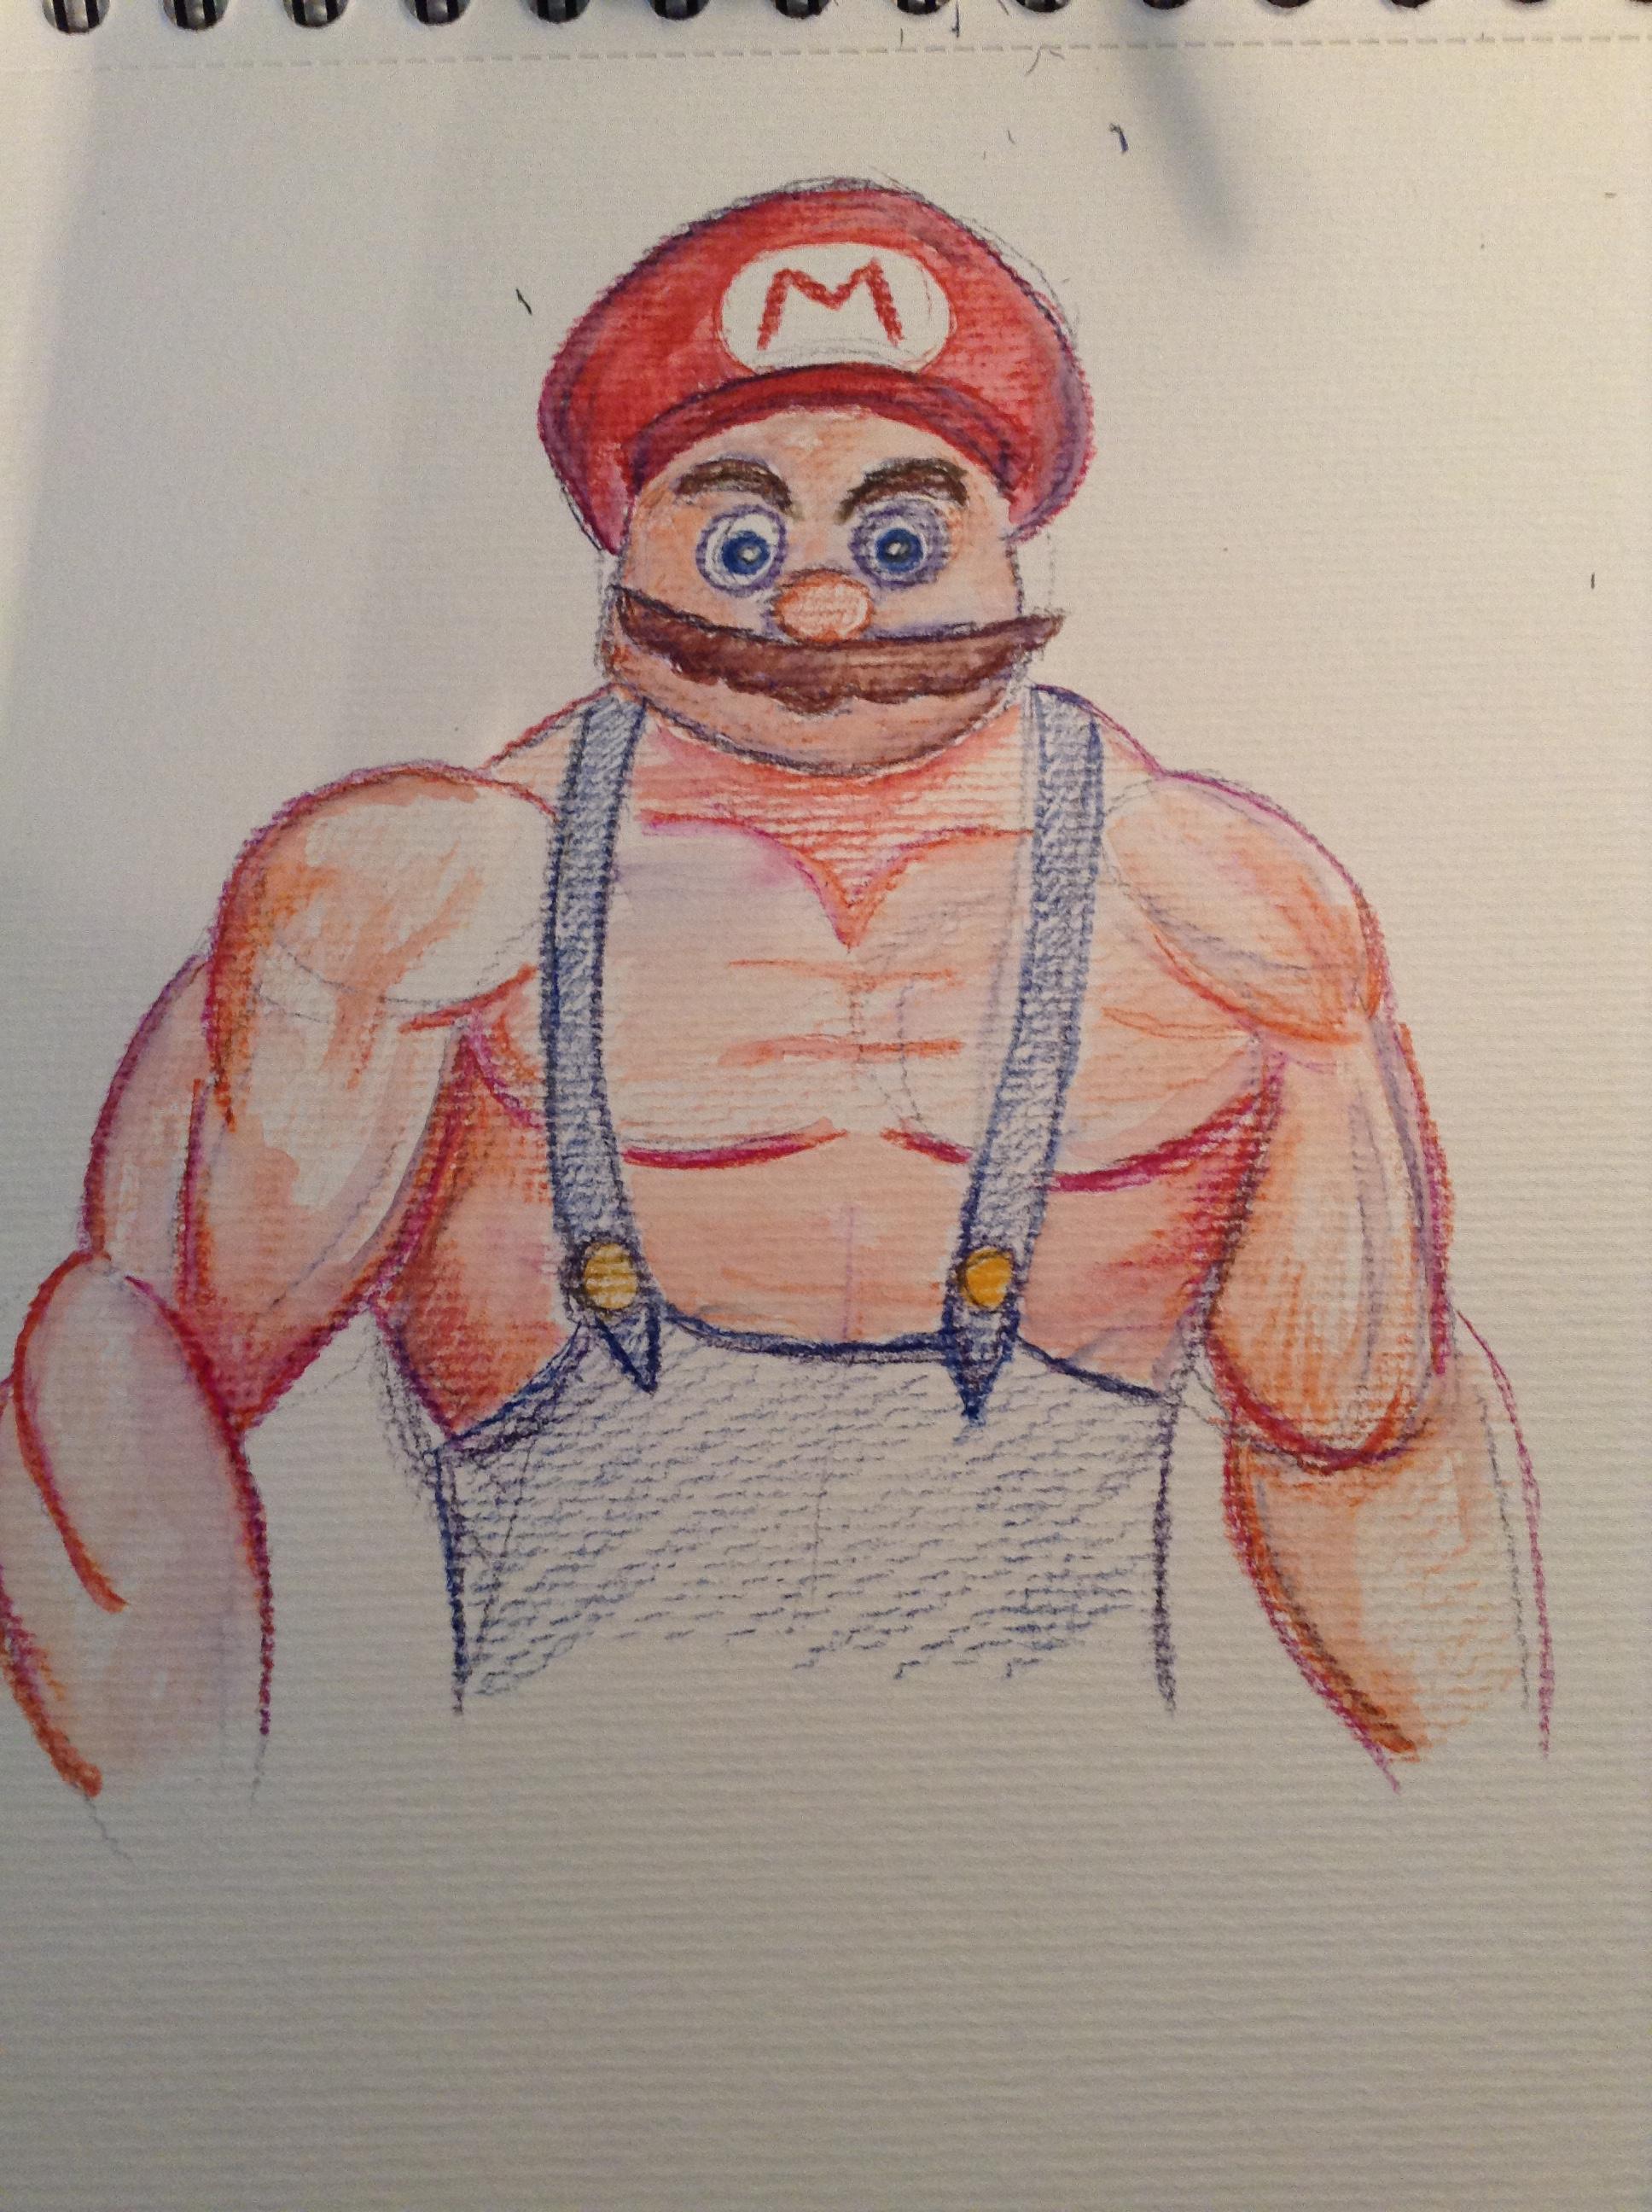 Itsa me Mario!